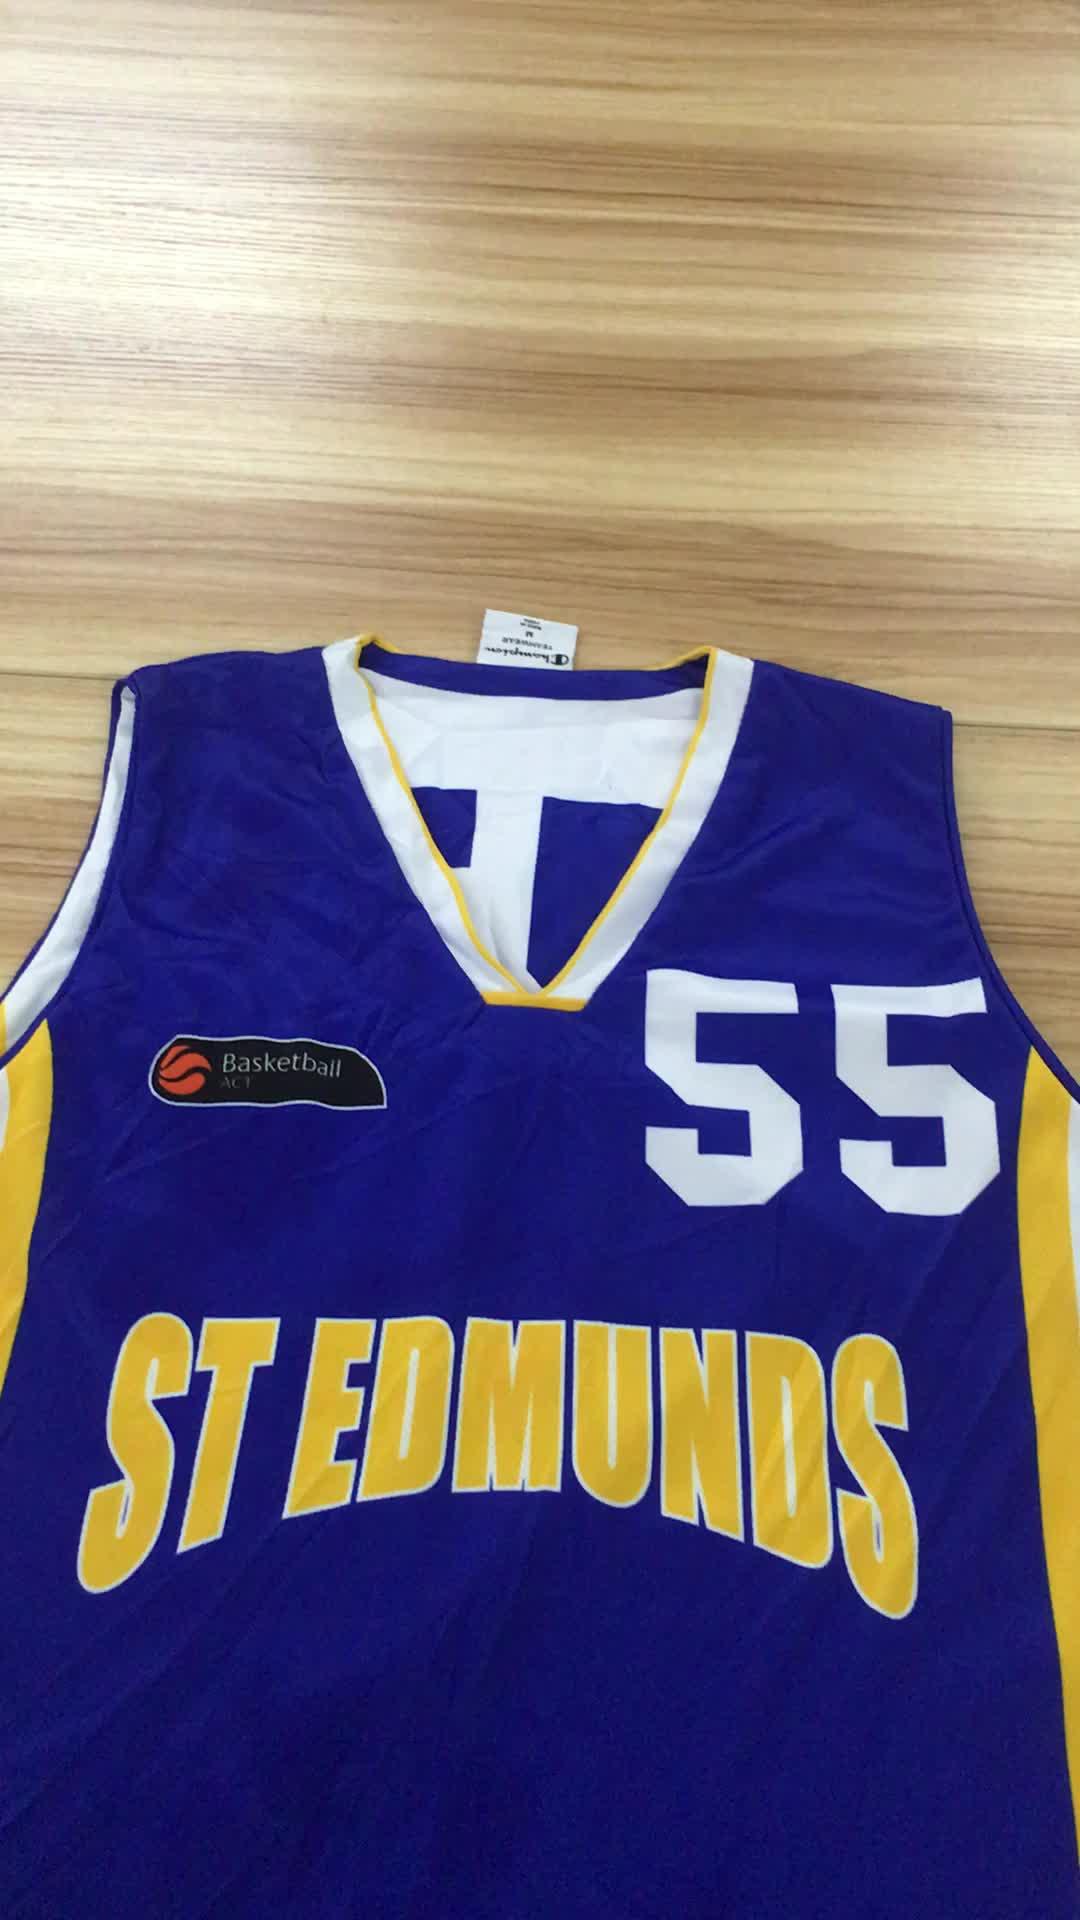 Jugend reversible individuelles Druck-Logo Basketball-Jersey-Shorts / Basketball-Team Uniform setzt Jersey-Shirts